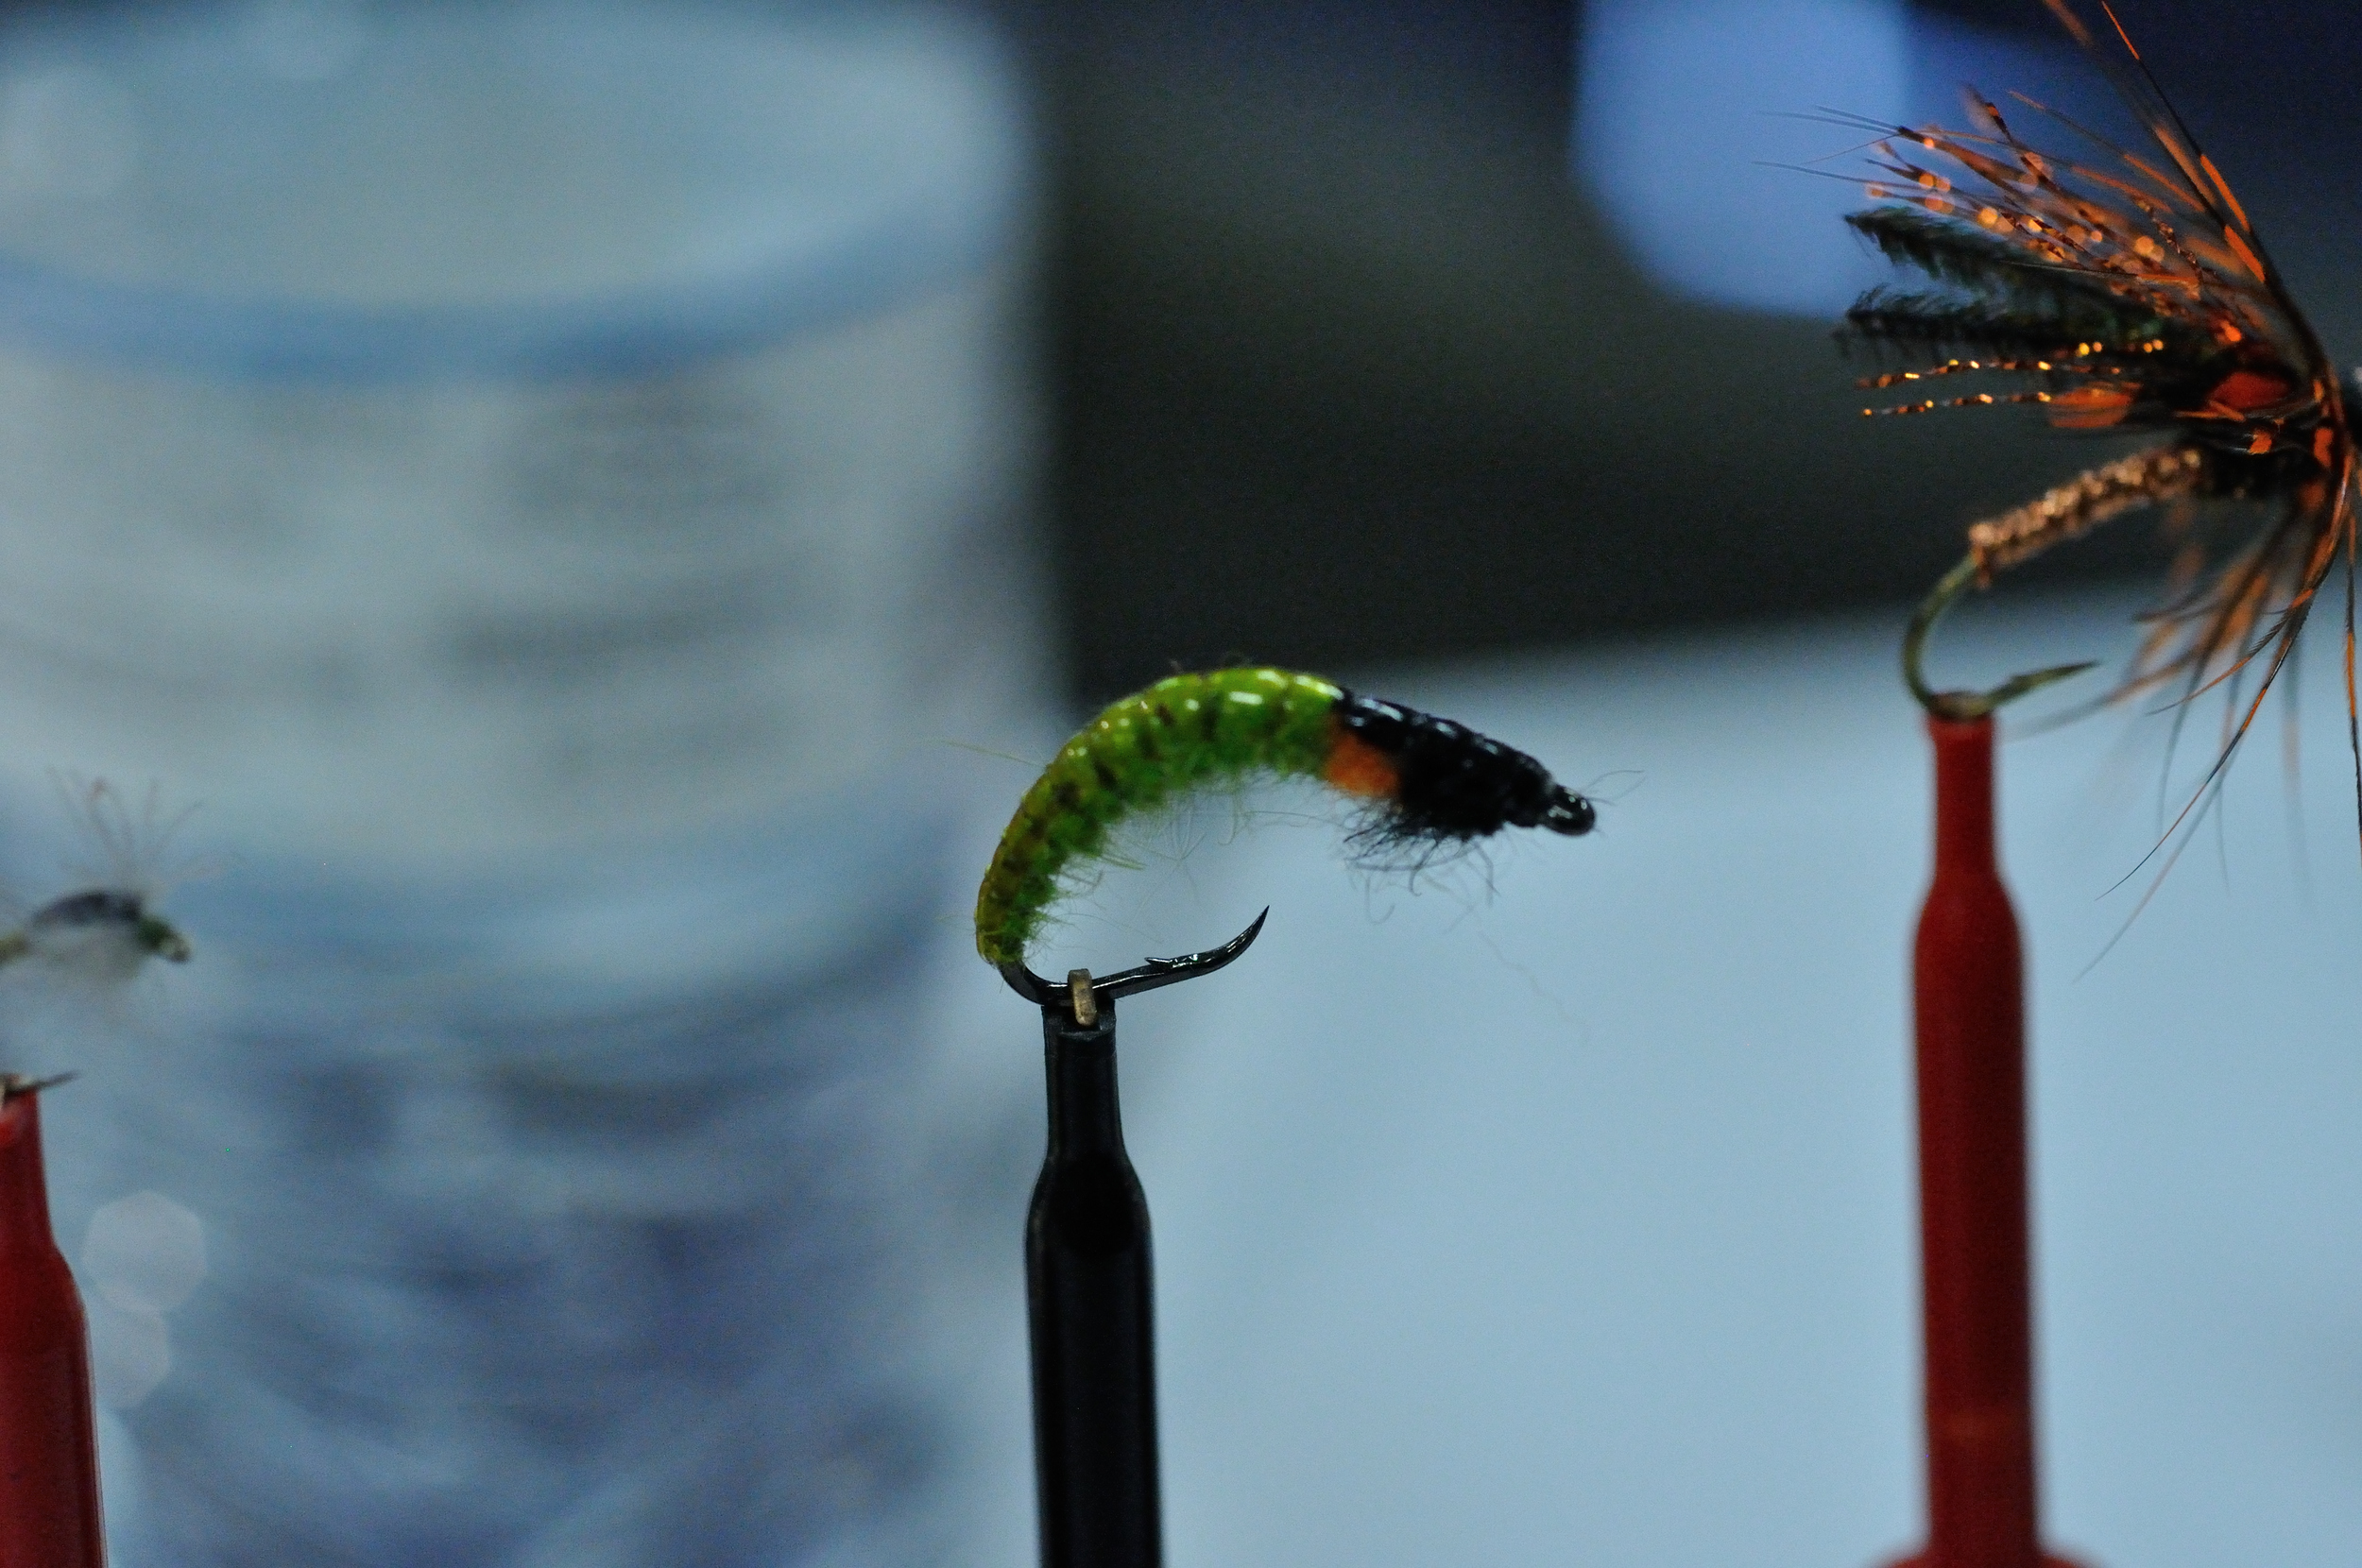 Green Rock Worm